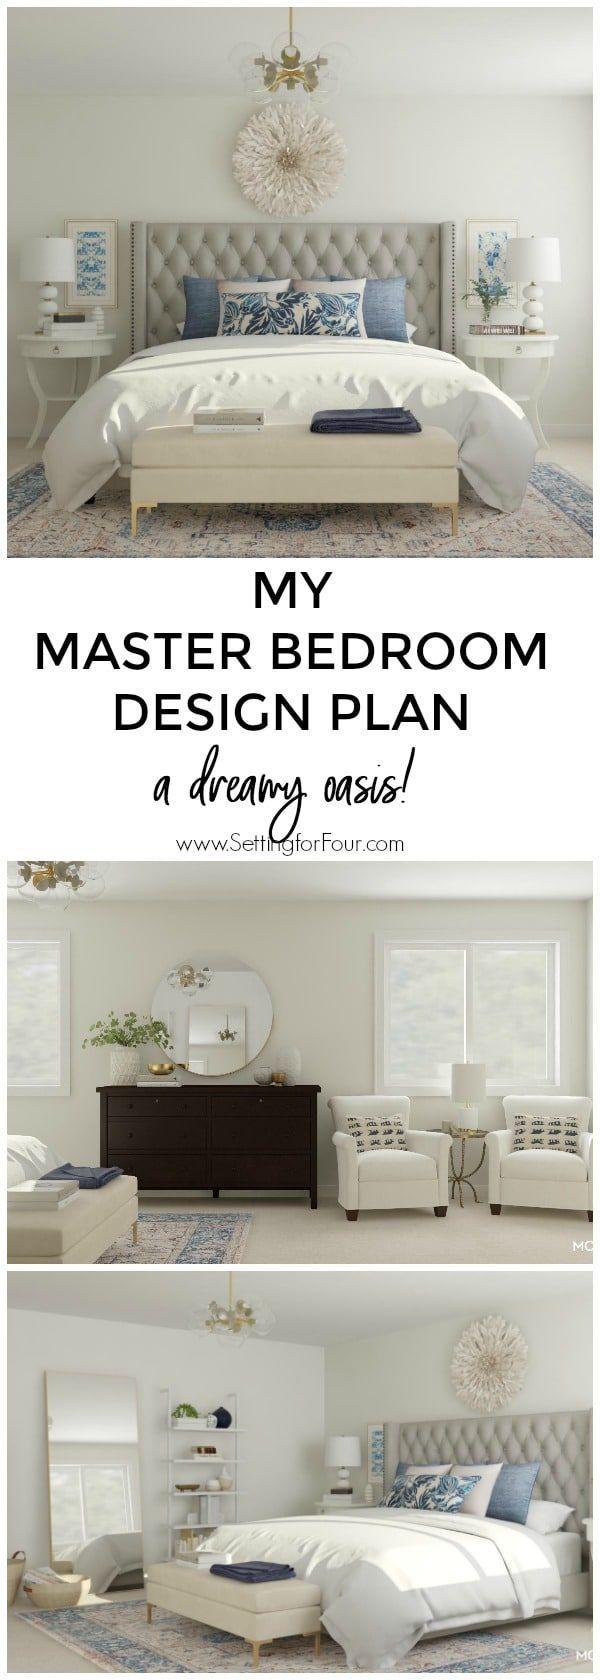 Küchenideen ahornschränke  gorgeous master bedroom design ideas with virtual d design  home